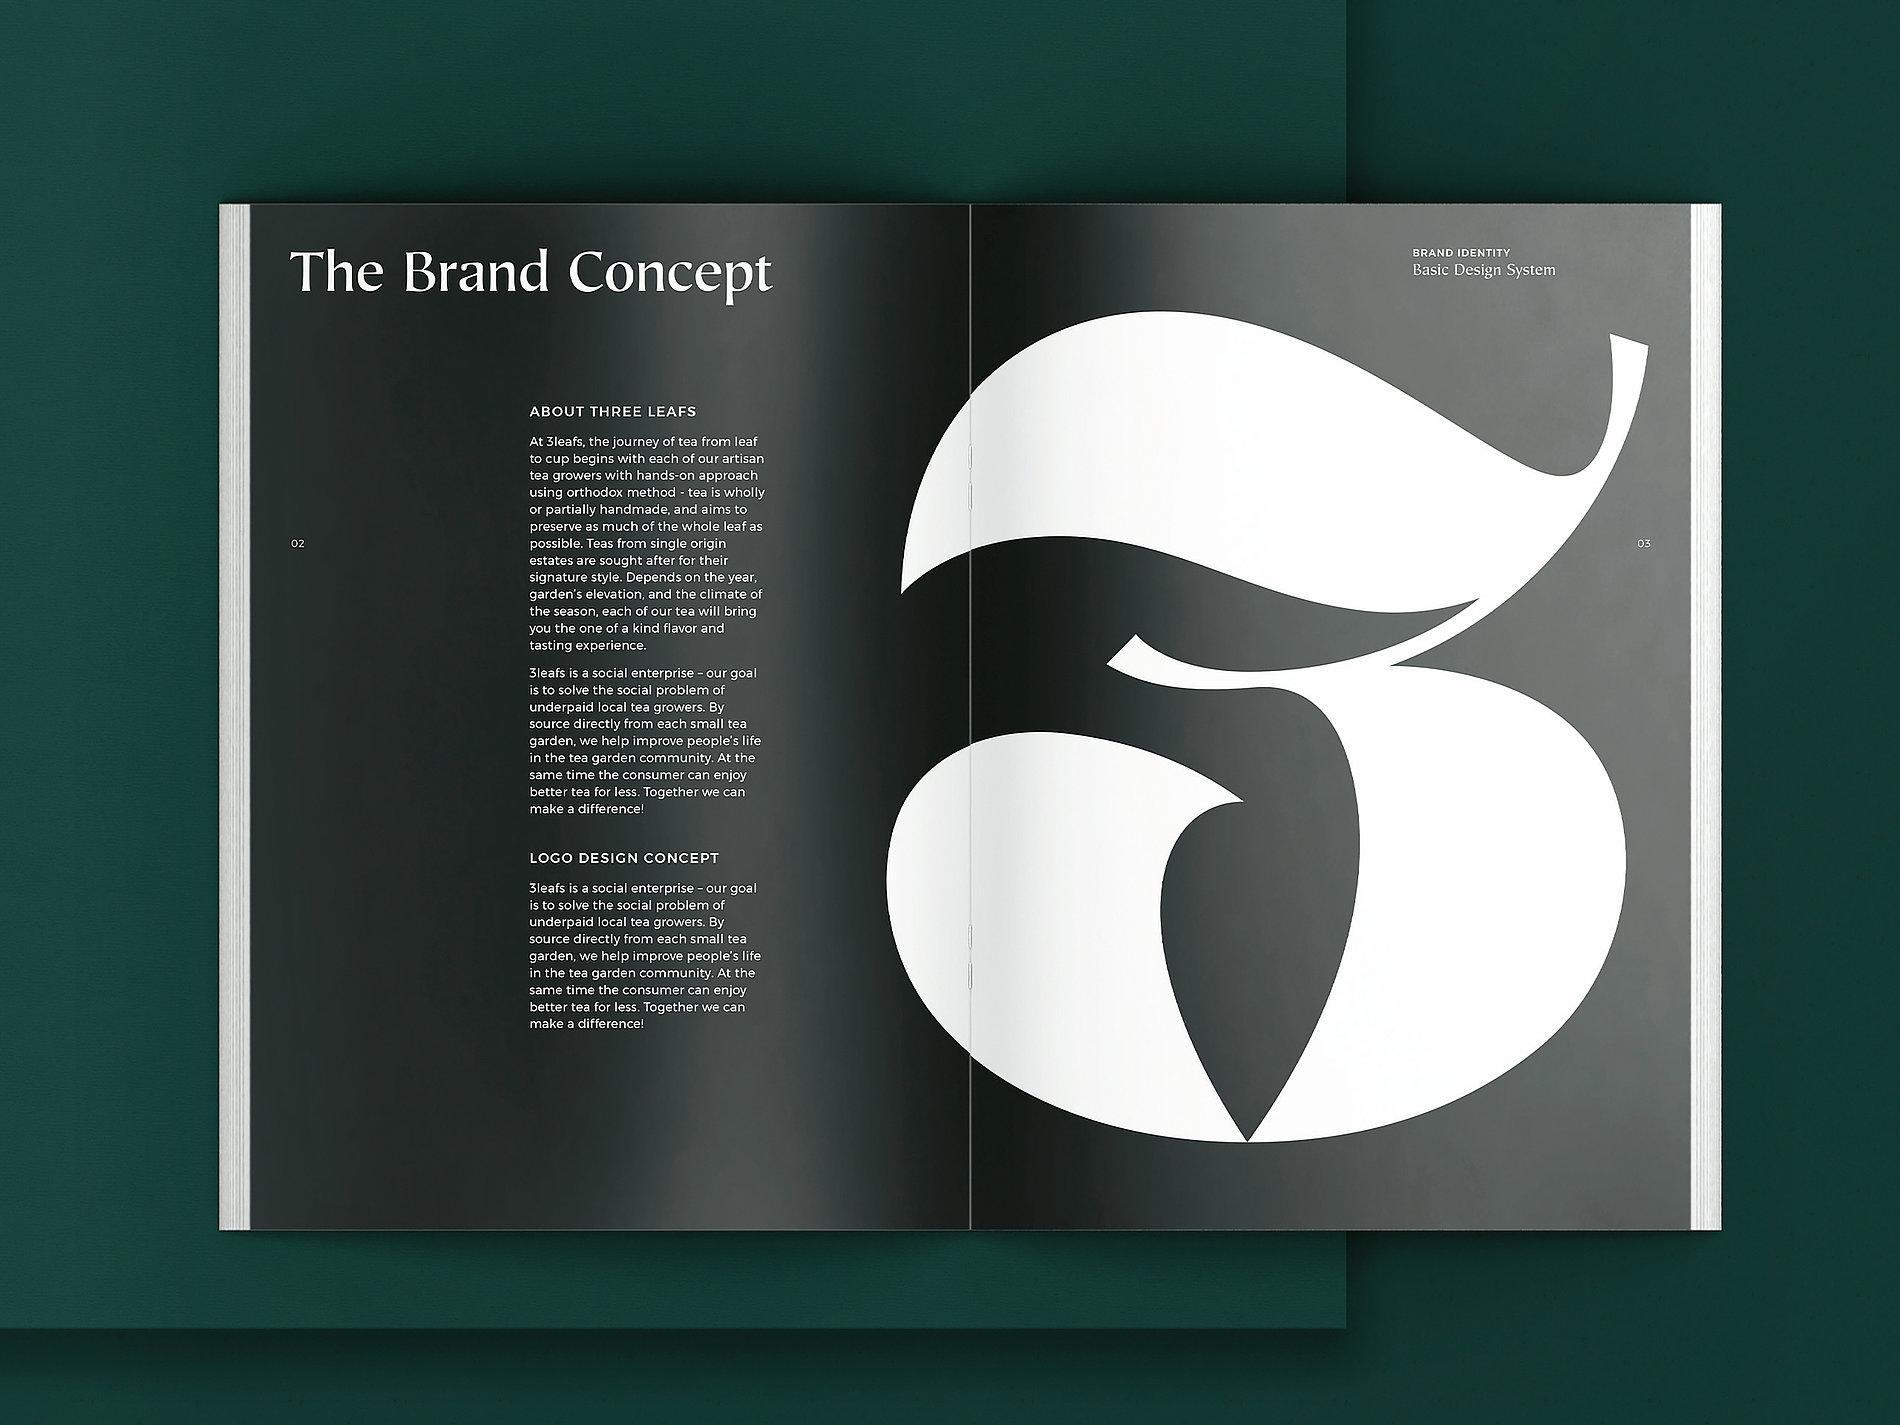 Three Leafs | Red Dot Design Award